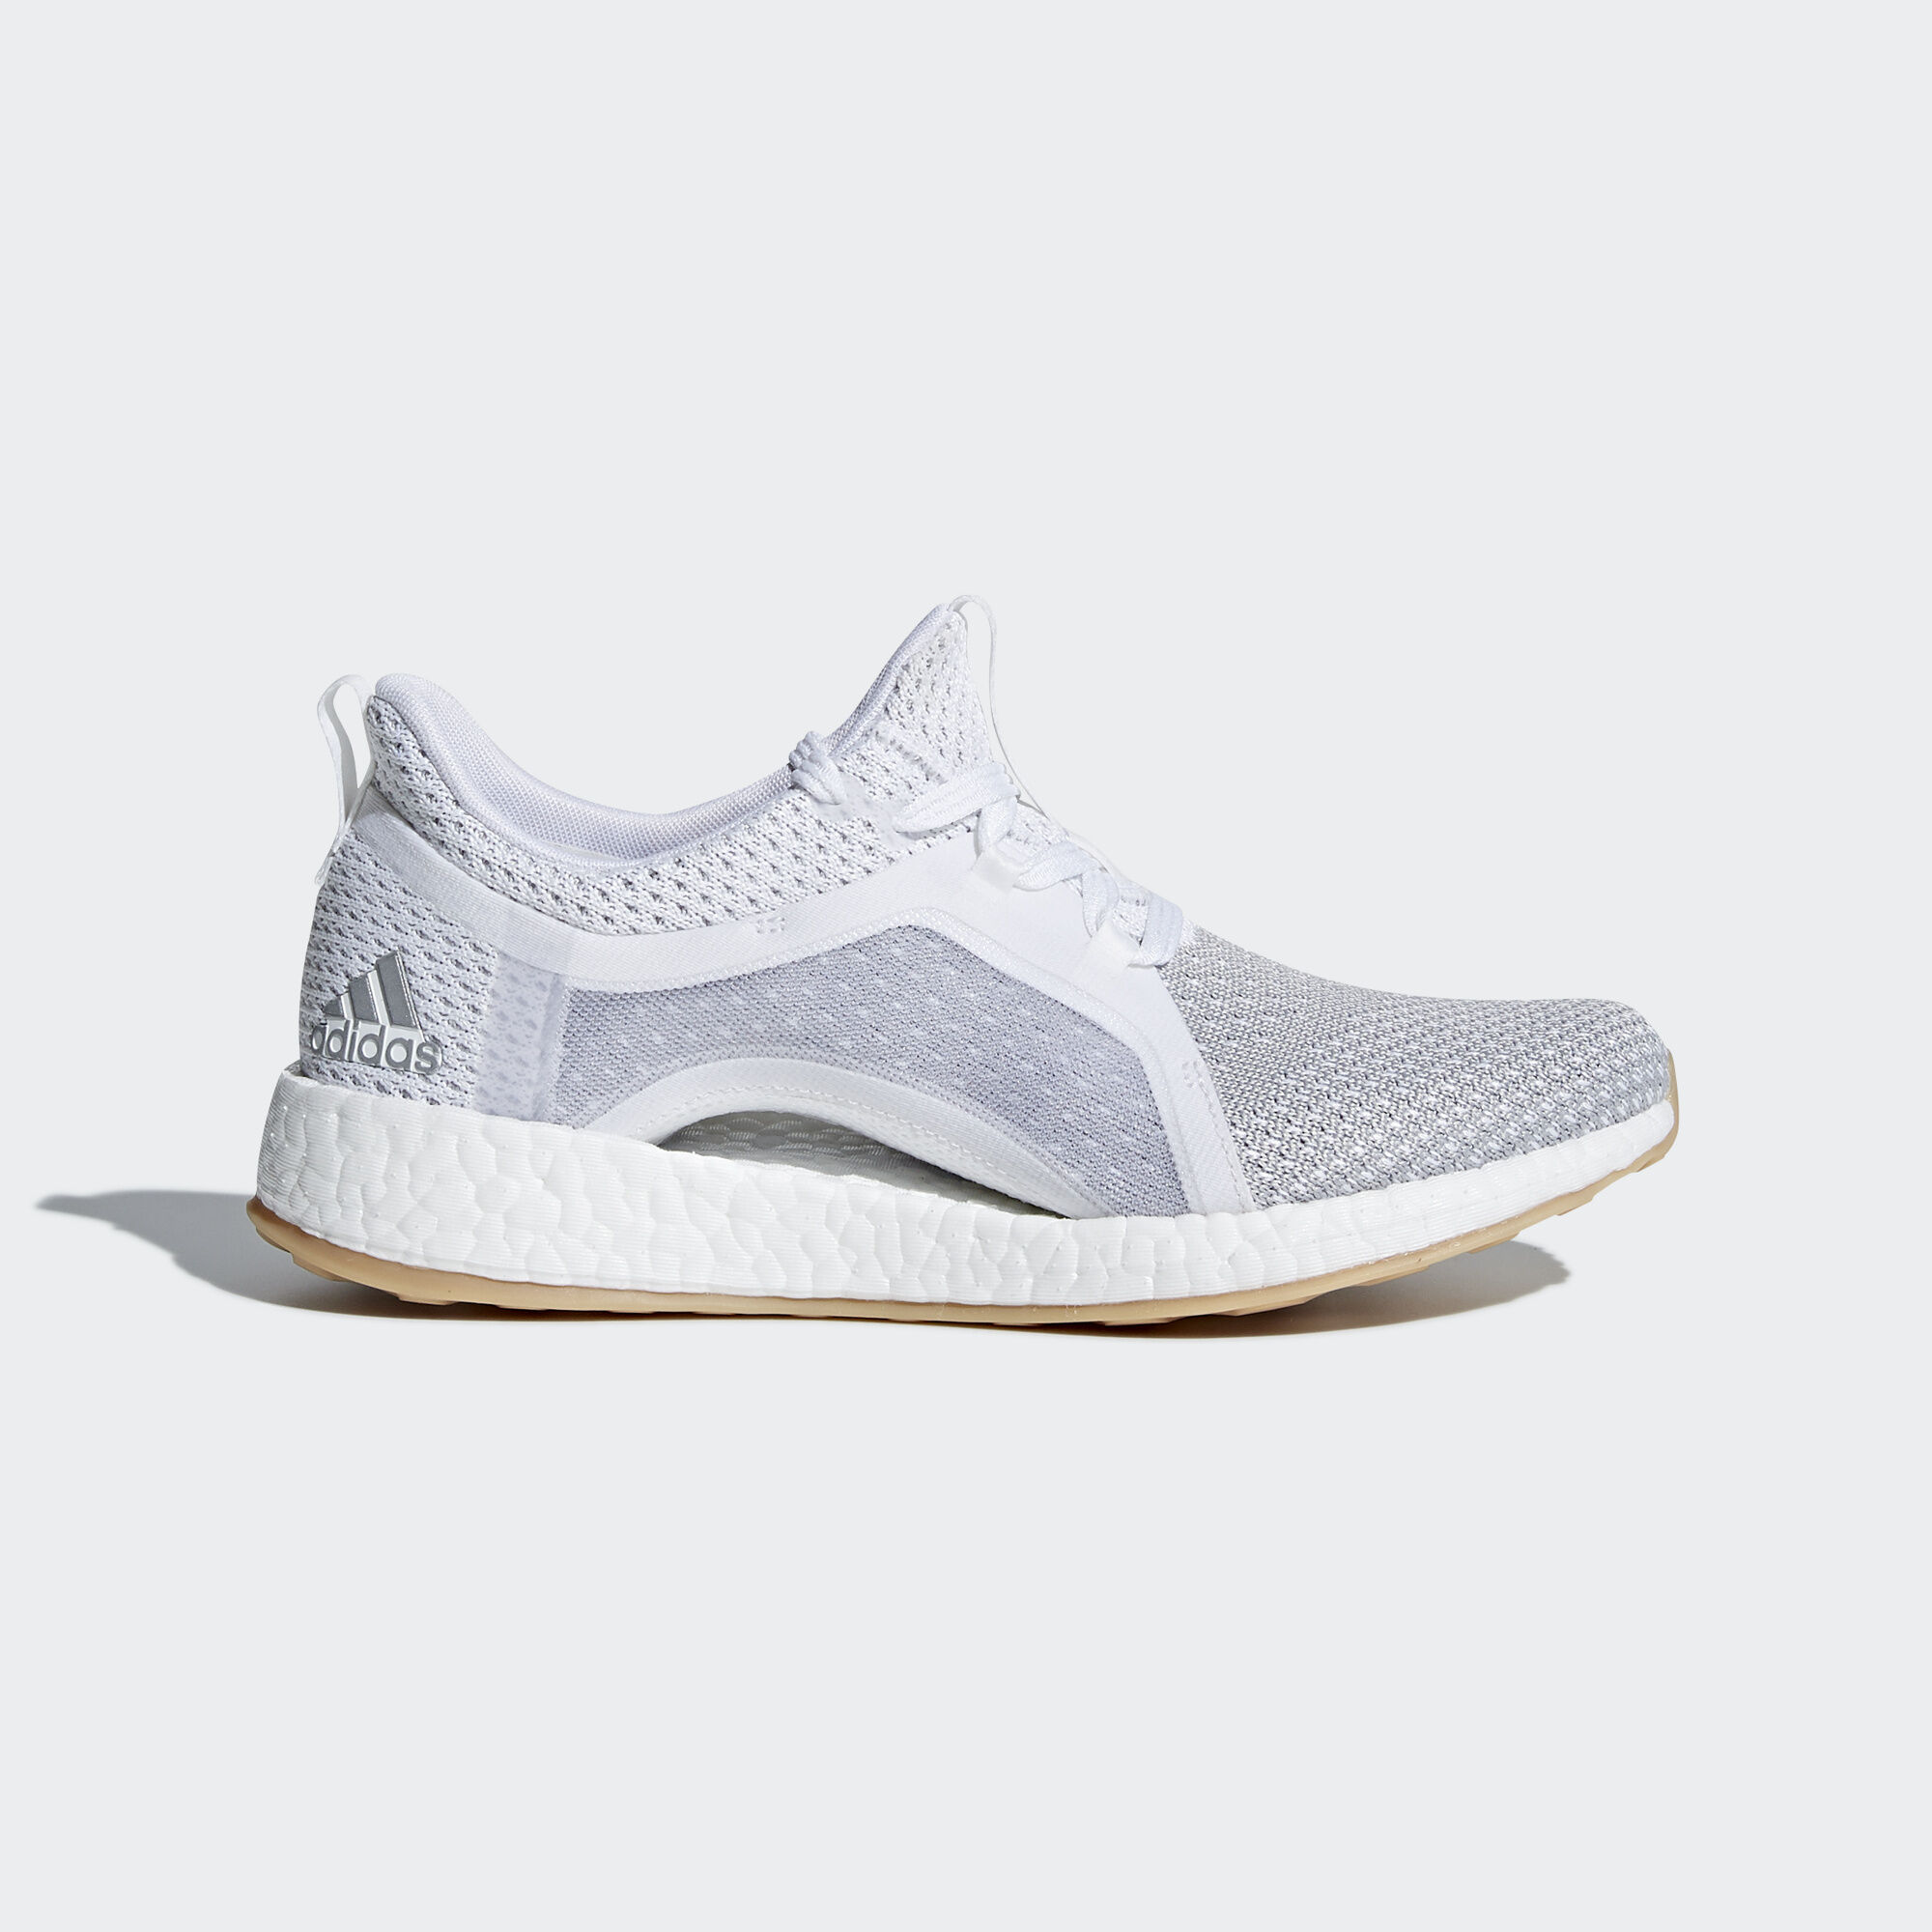 65247474f24 adidas - Pureboost X Clima Shoes Ftwr White Silver Metallic Grey Two BB6089